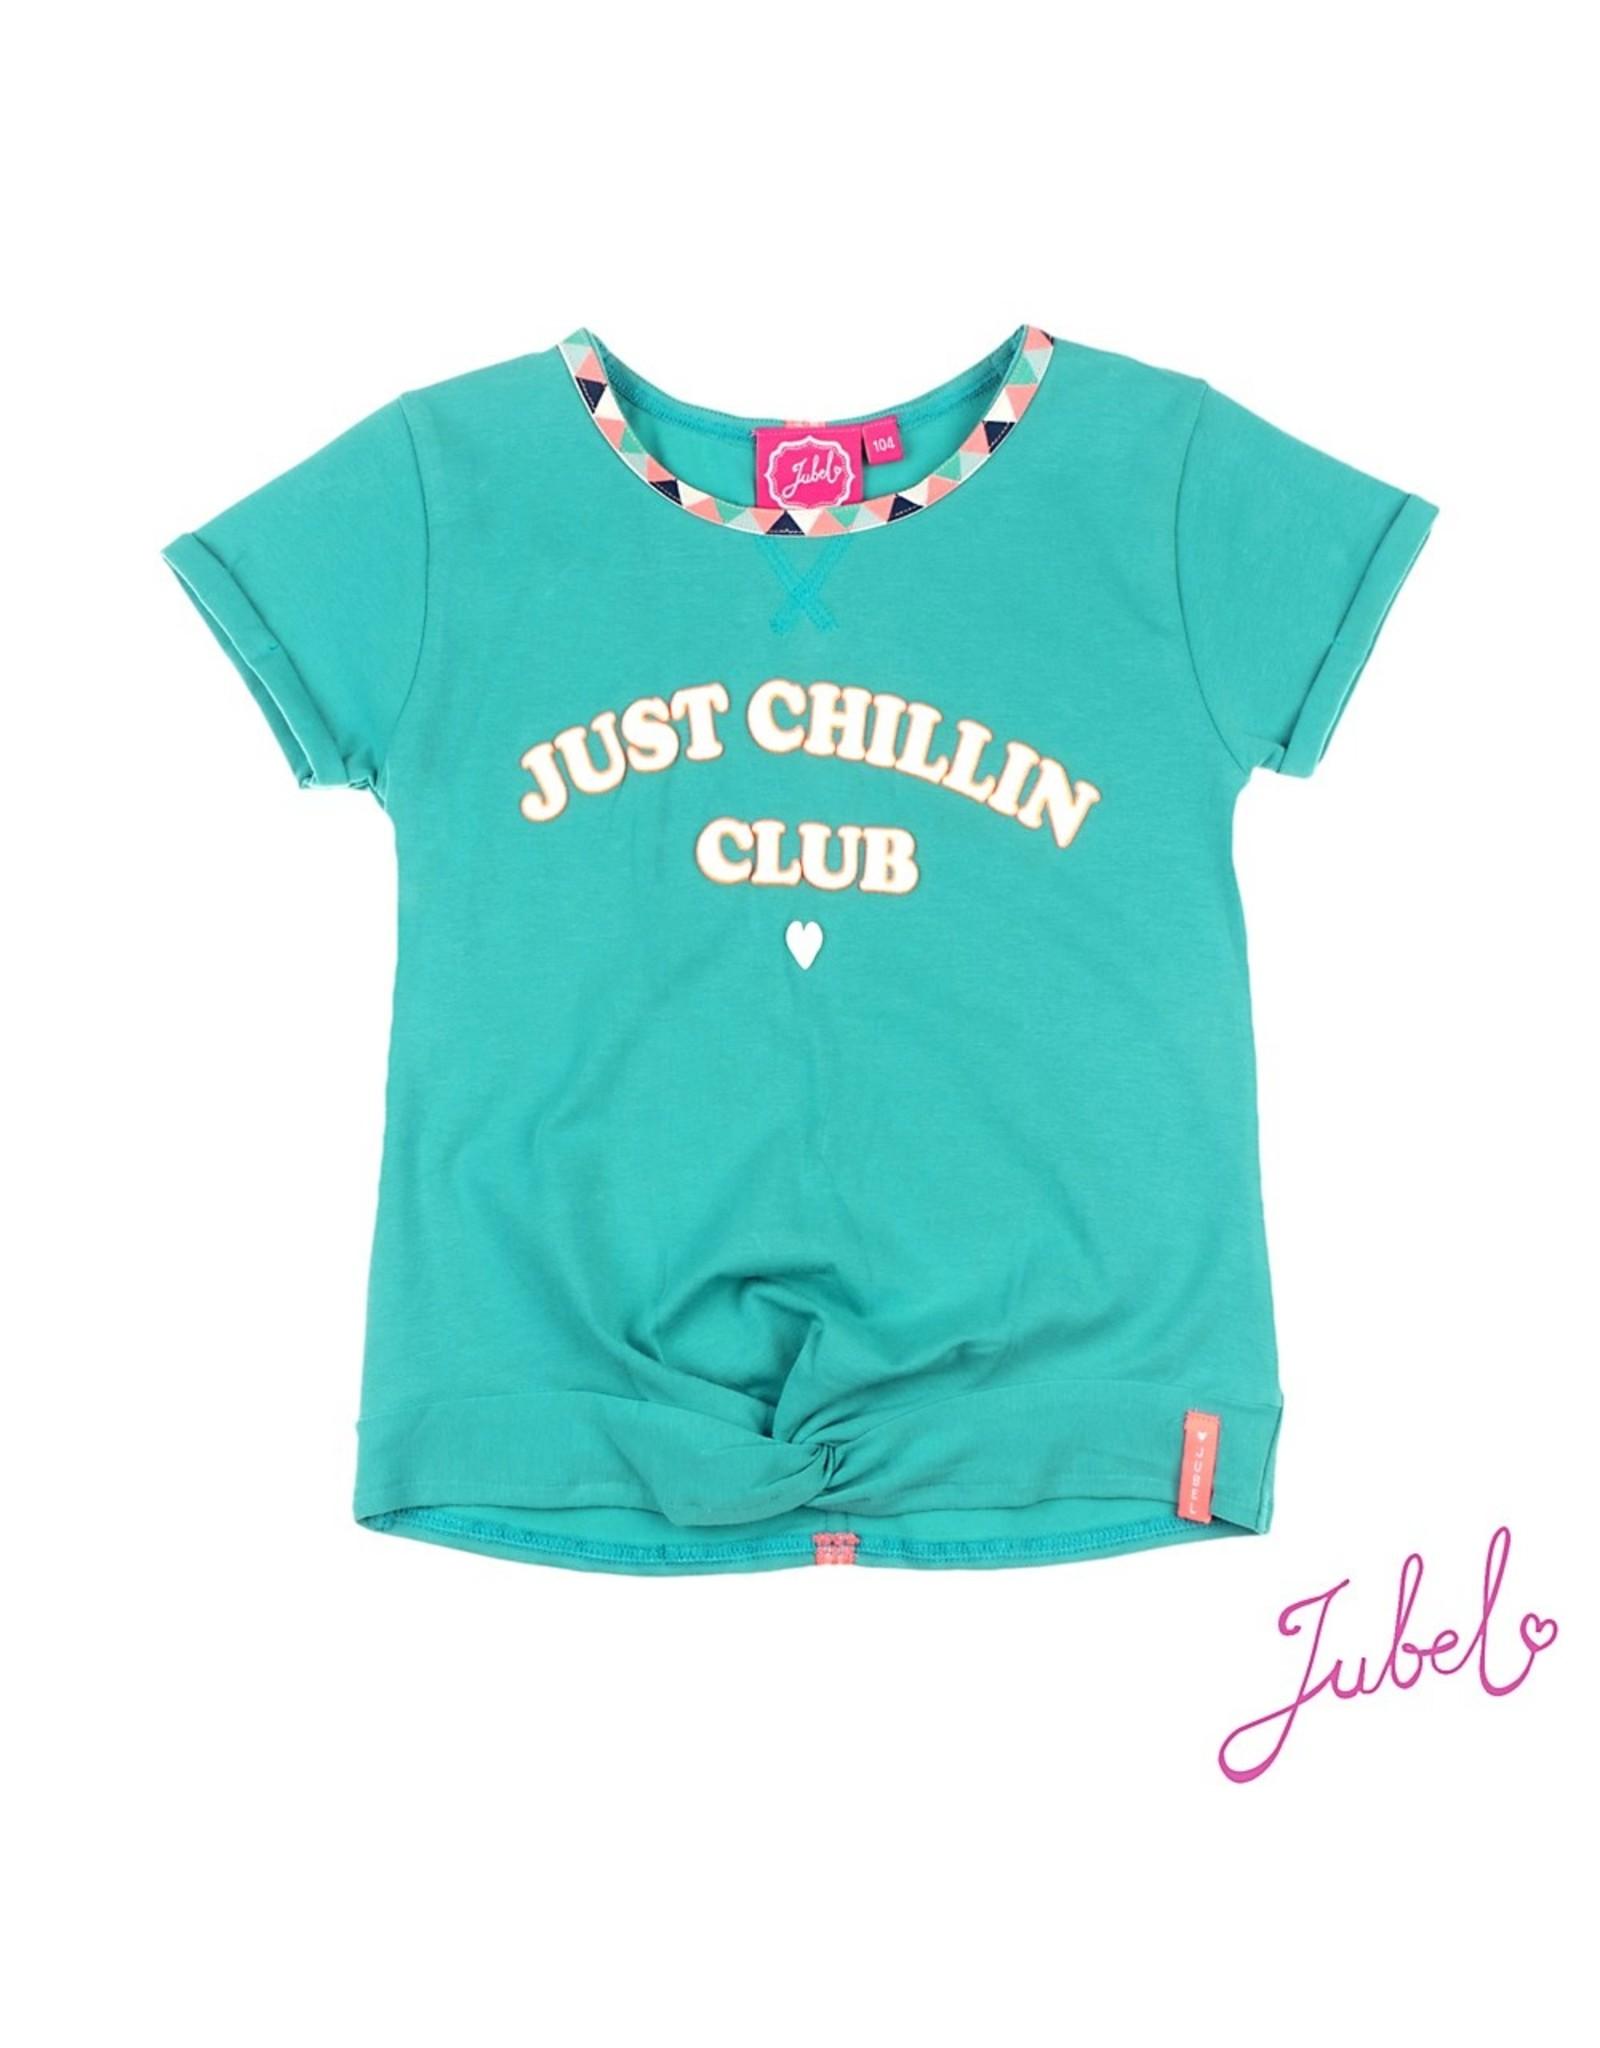 Jubel Crop Top Just Chillin Club - Botanic Blush maat 92